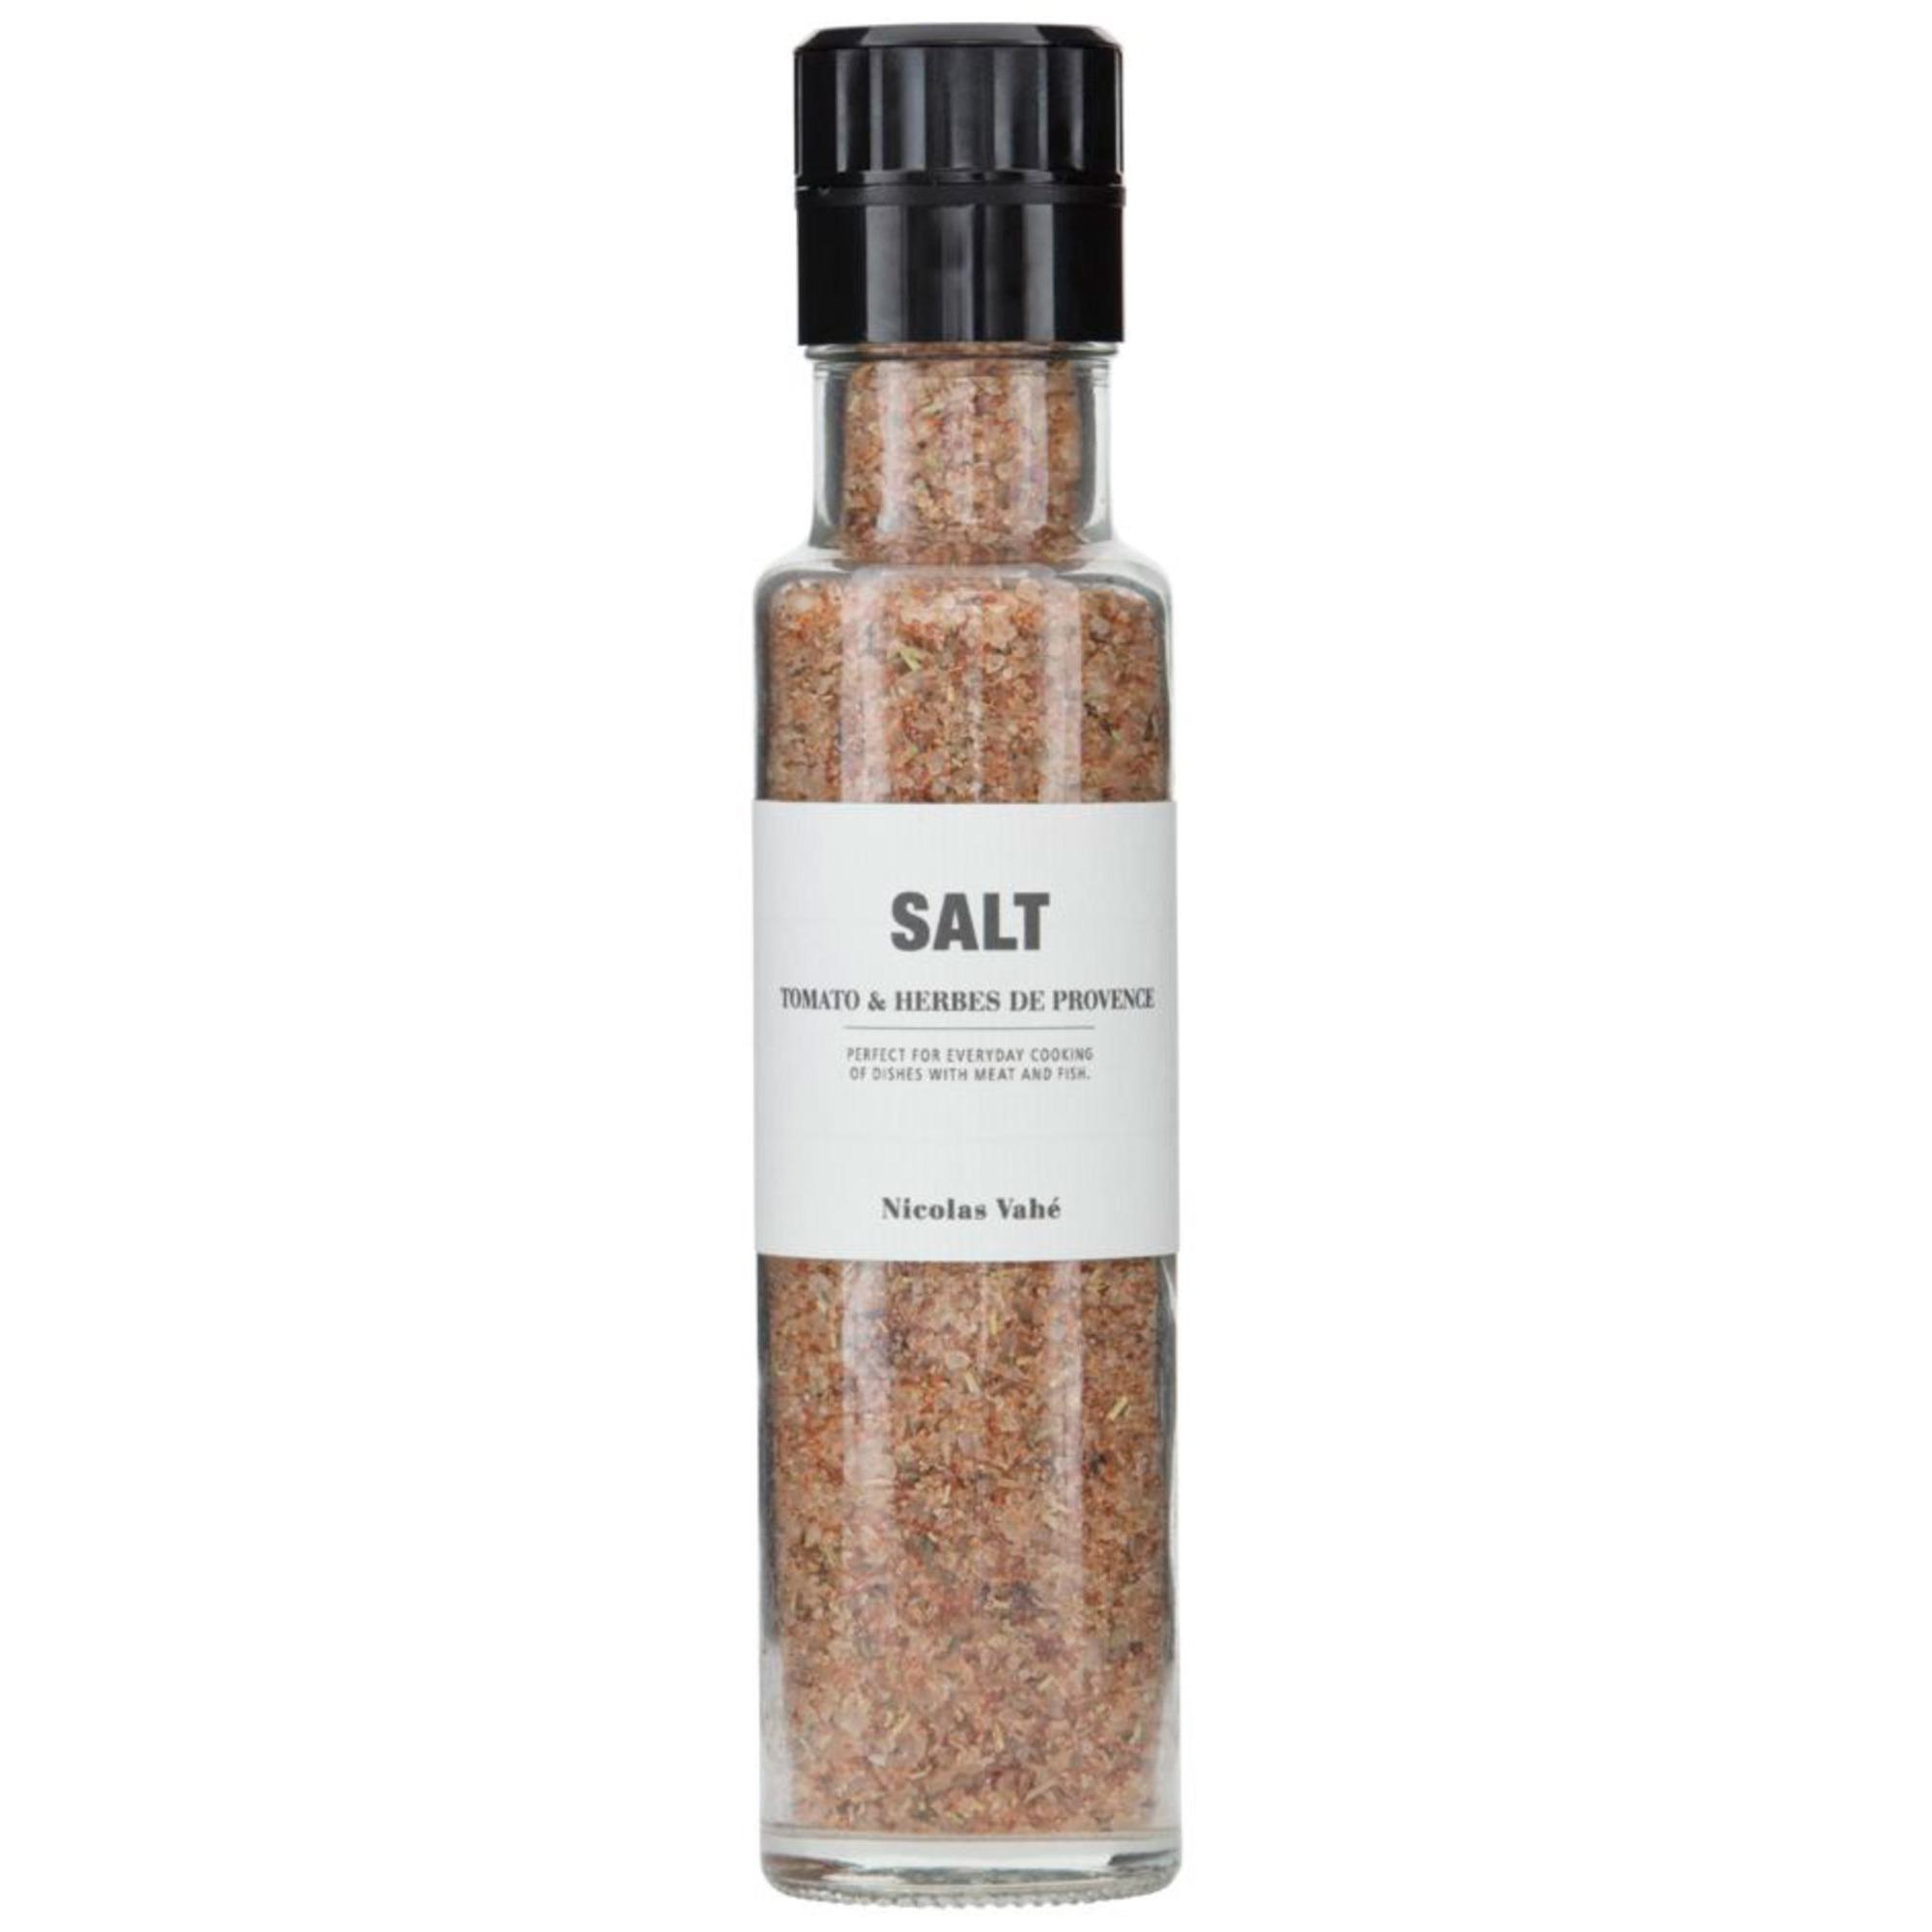 Nicolas Vahé Salt m. tomat och herbes de provence